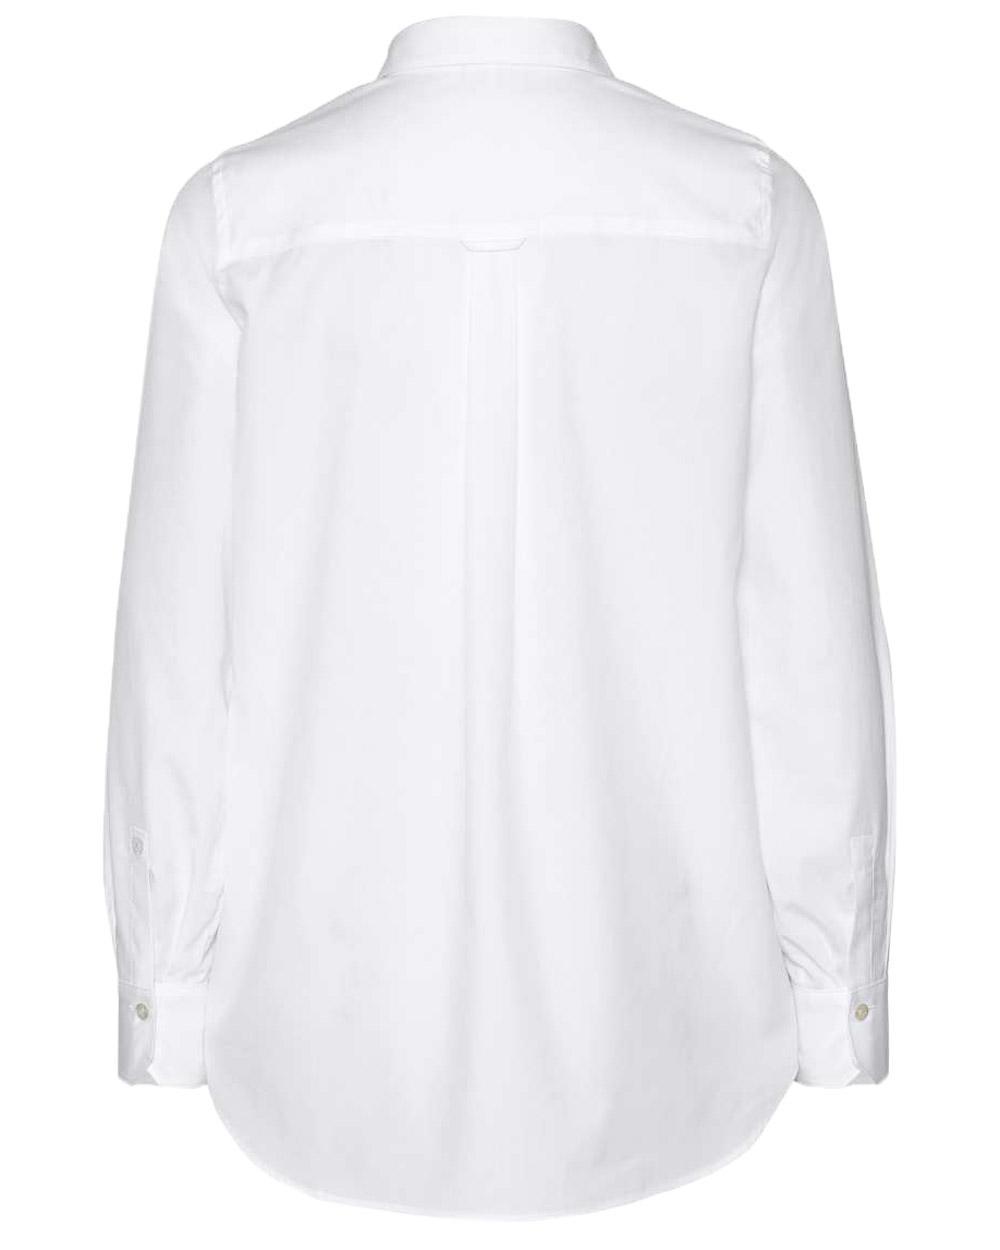 nette blouse